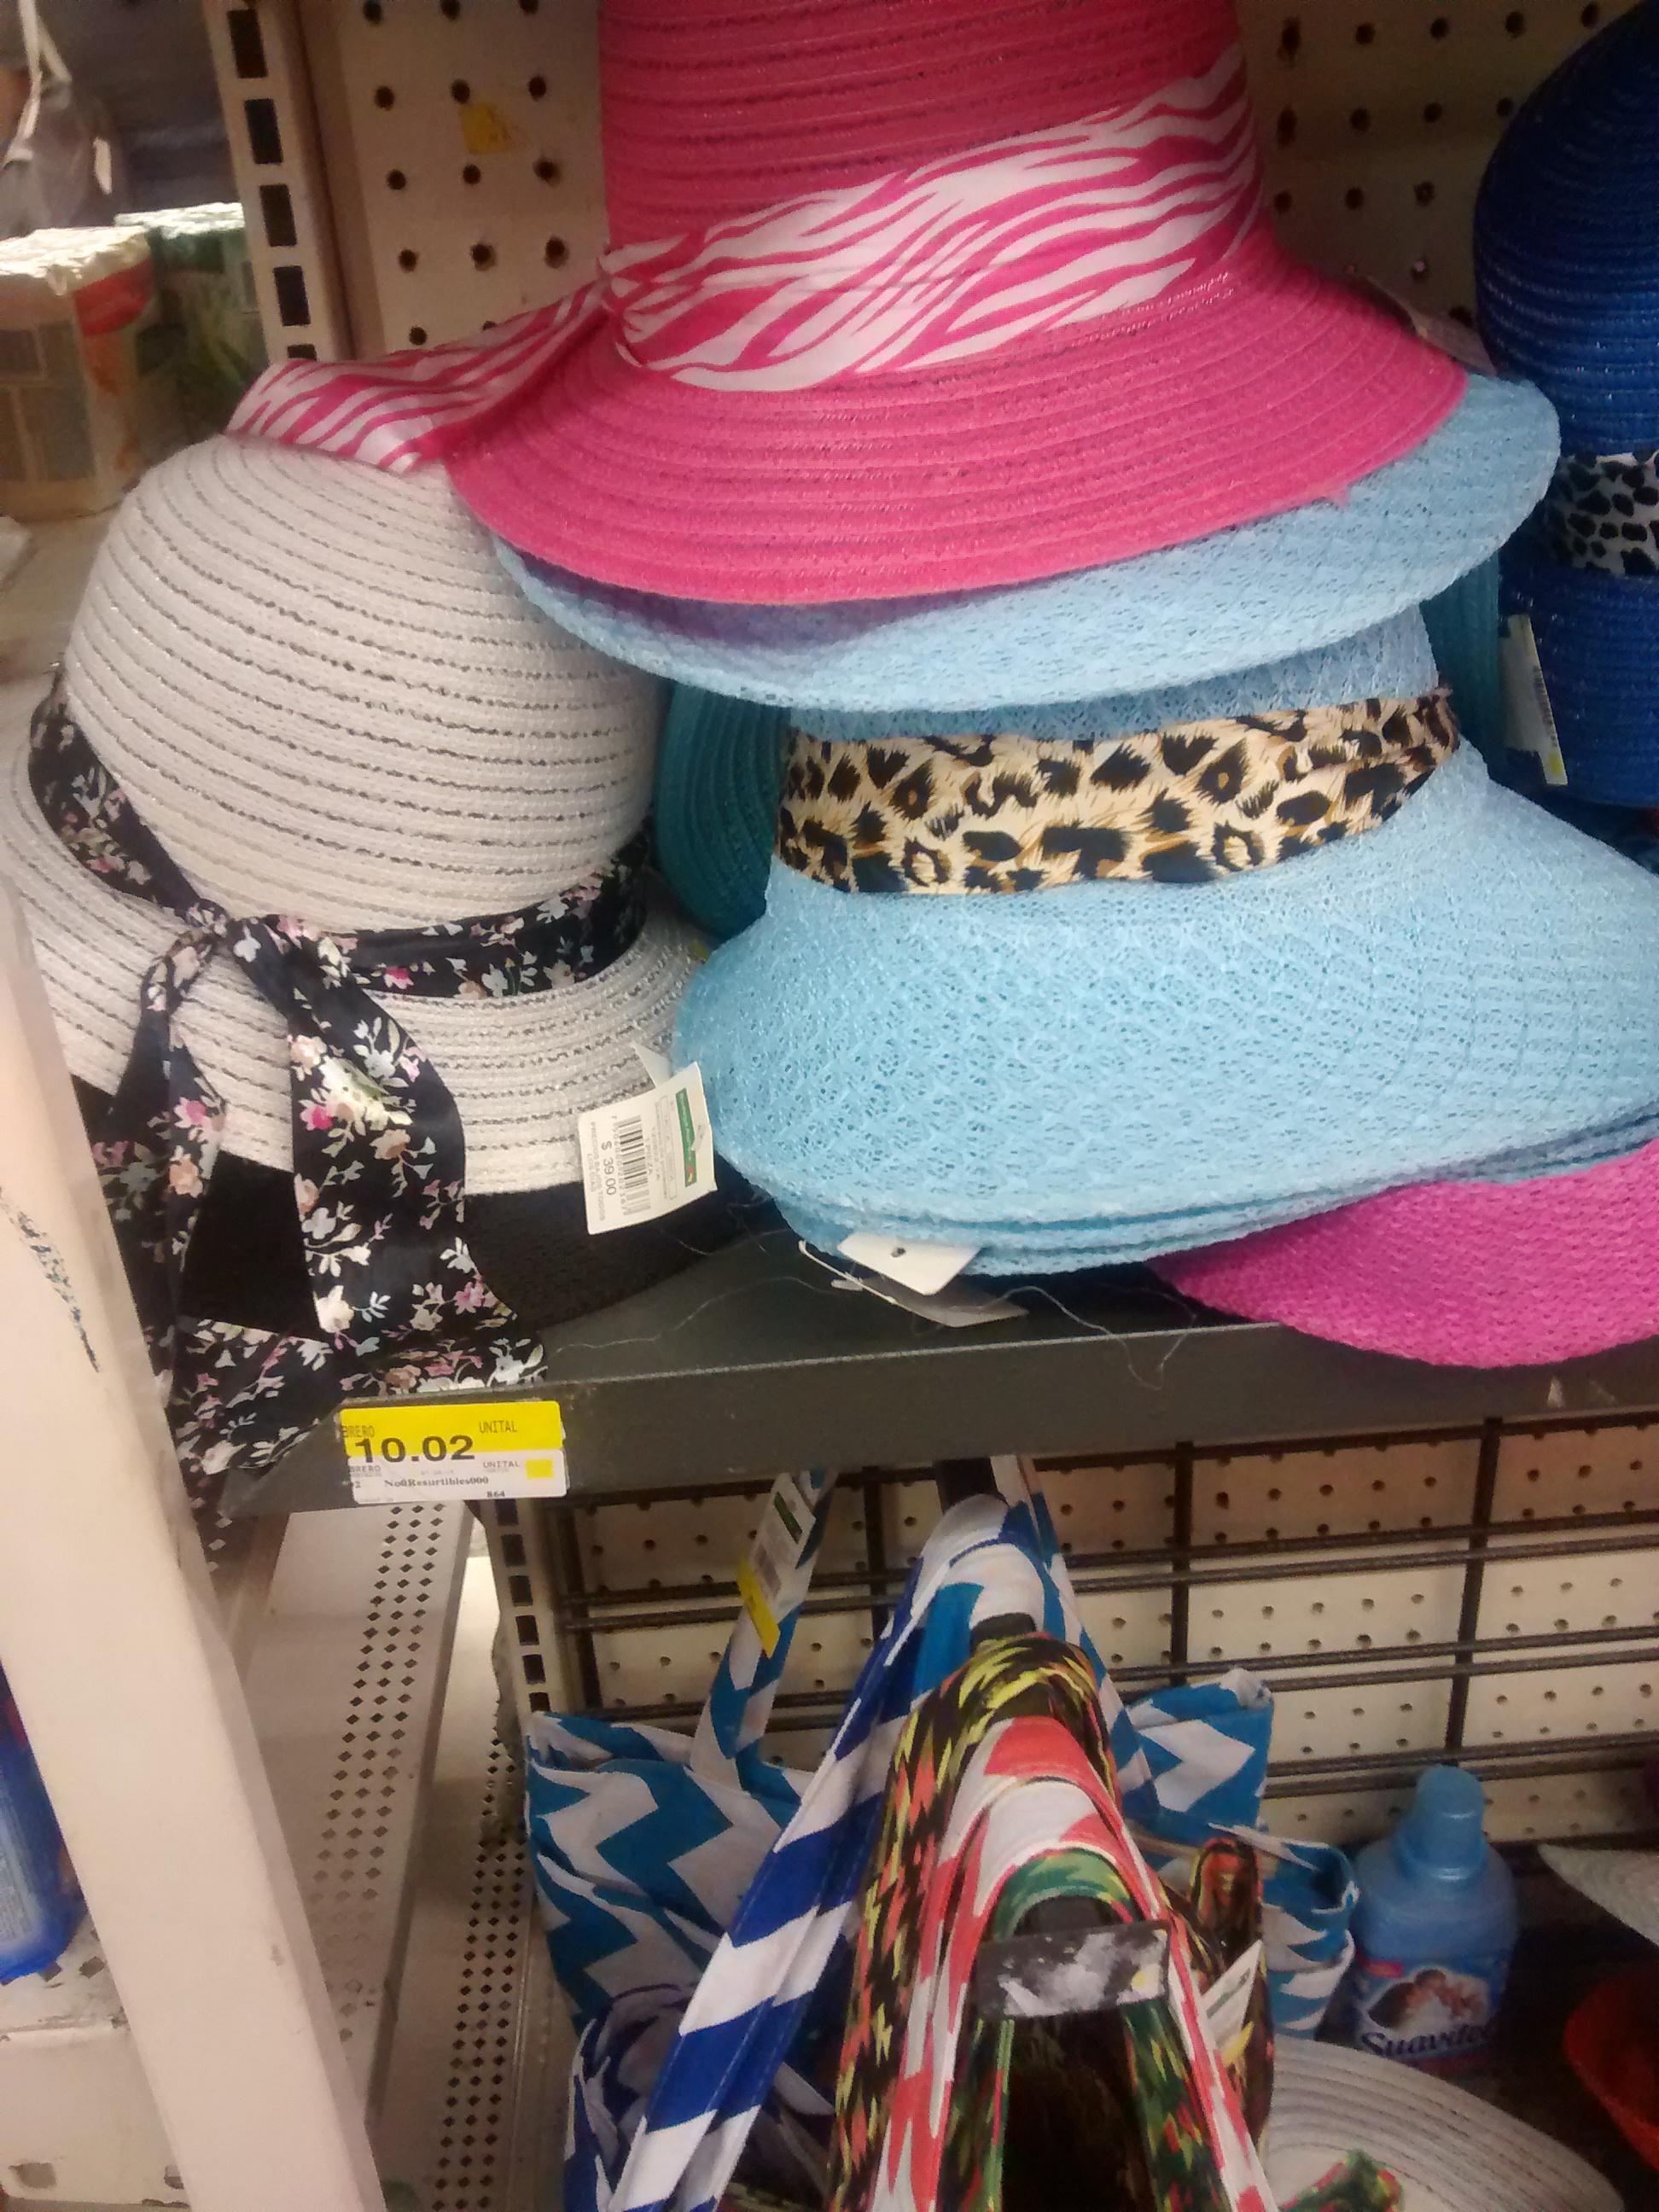 Bodega Aurrerá: Sombrero p/ dama $10.02 Y caparazón tortugas ninja P/ niño 38.02